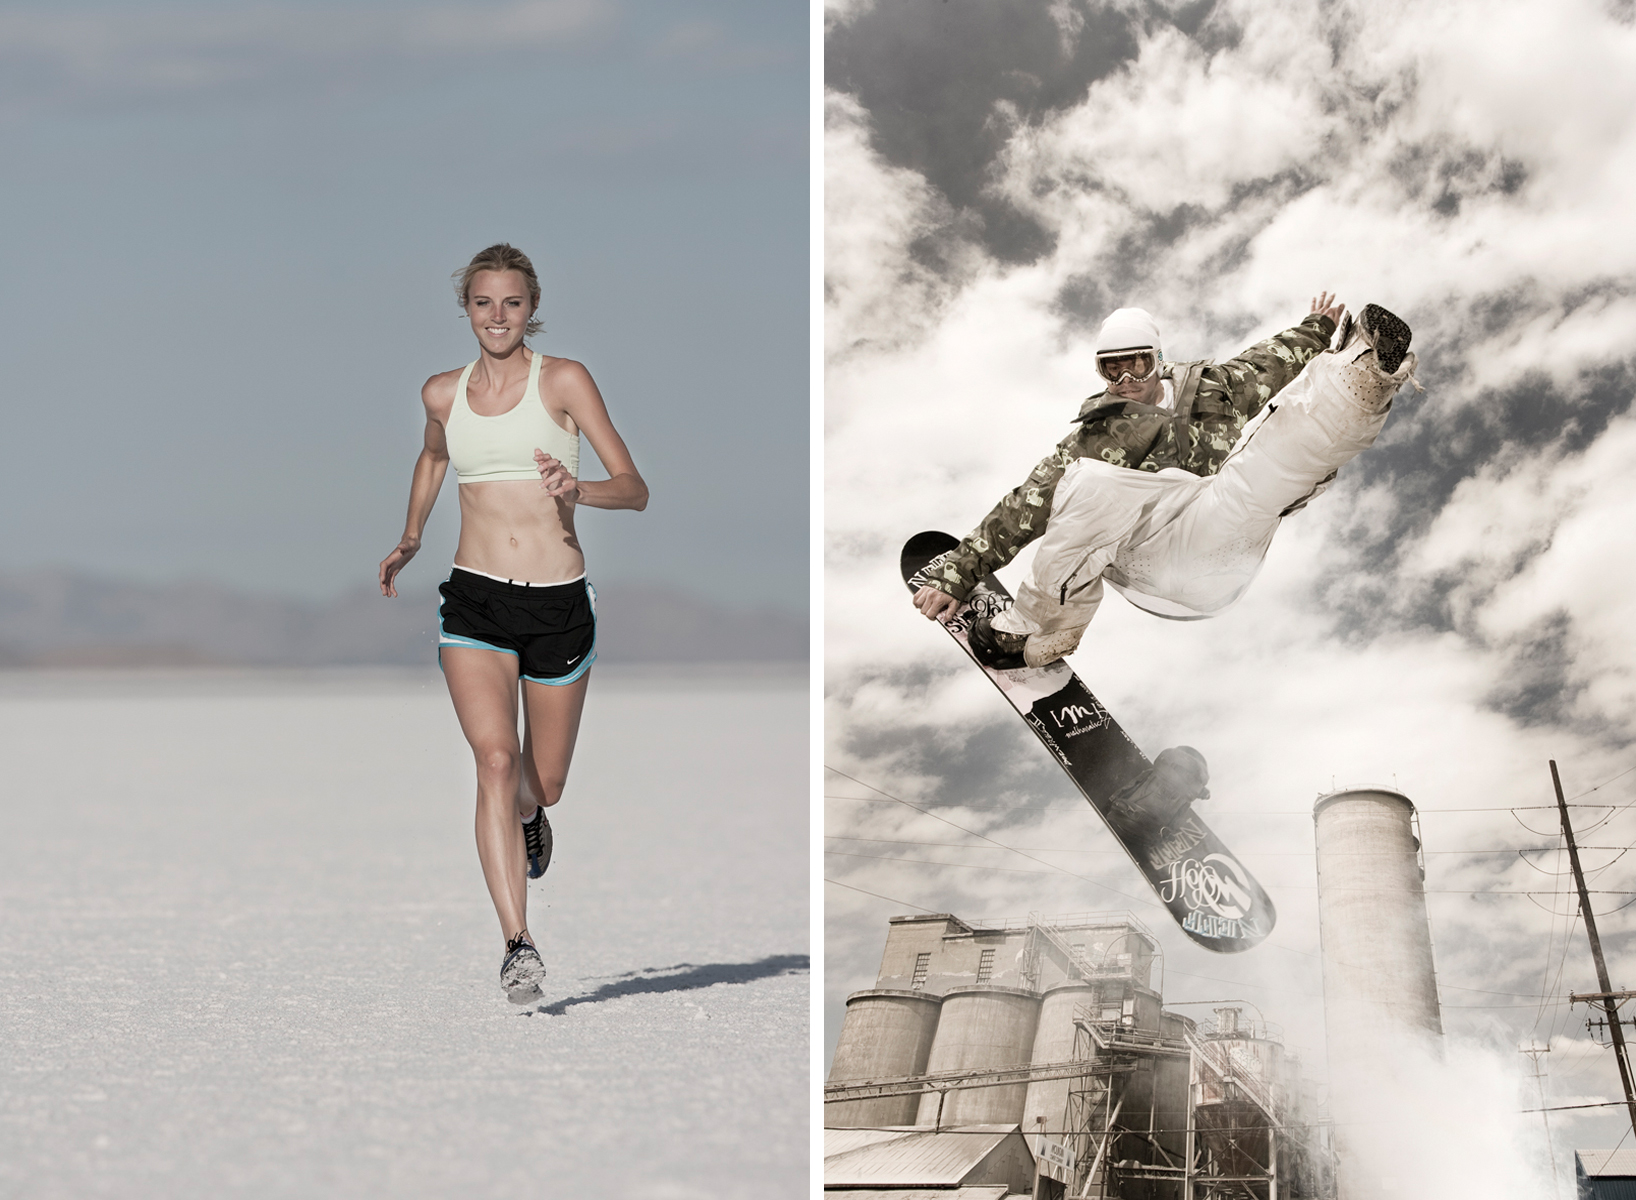 Snowboard_Running